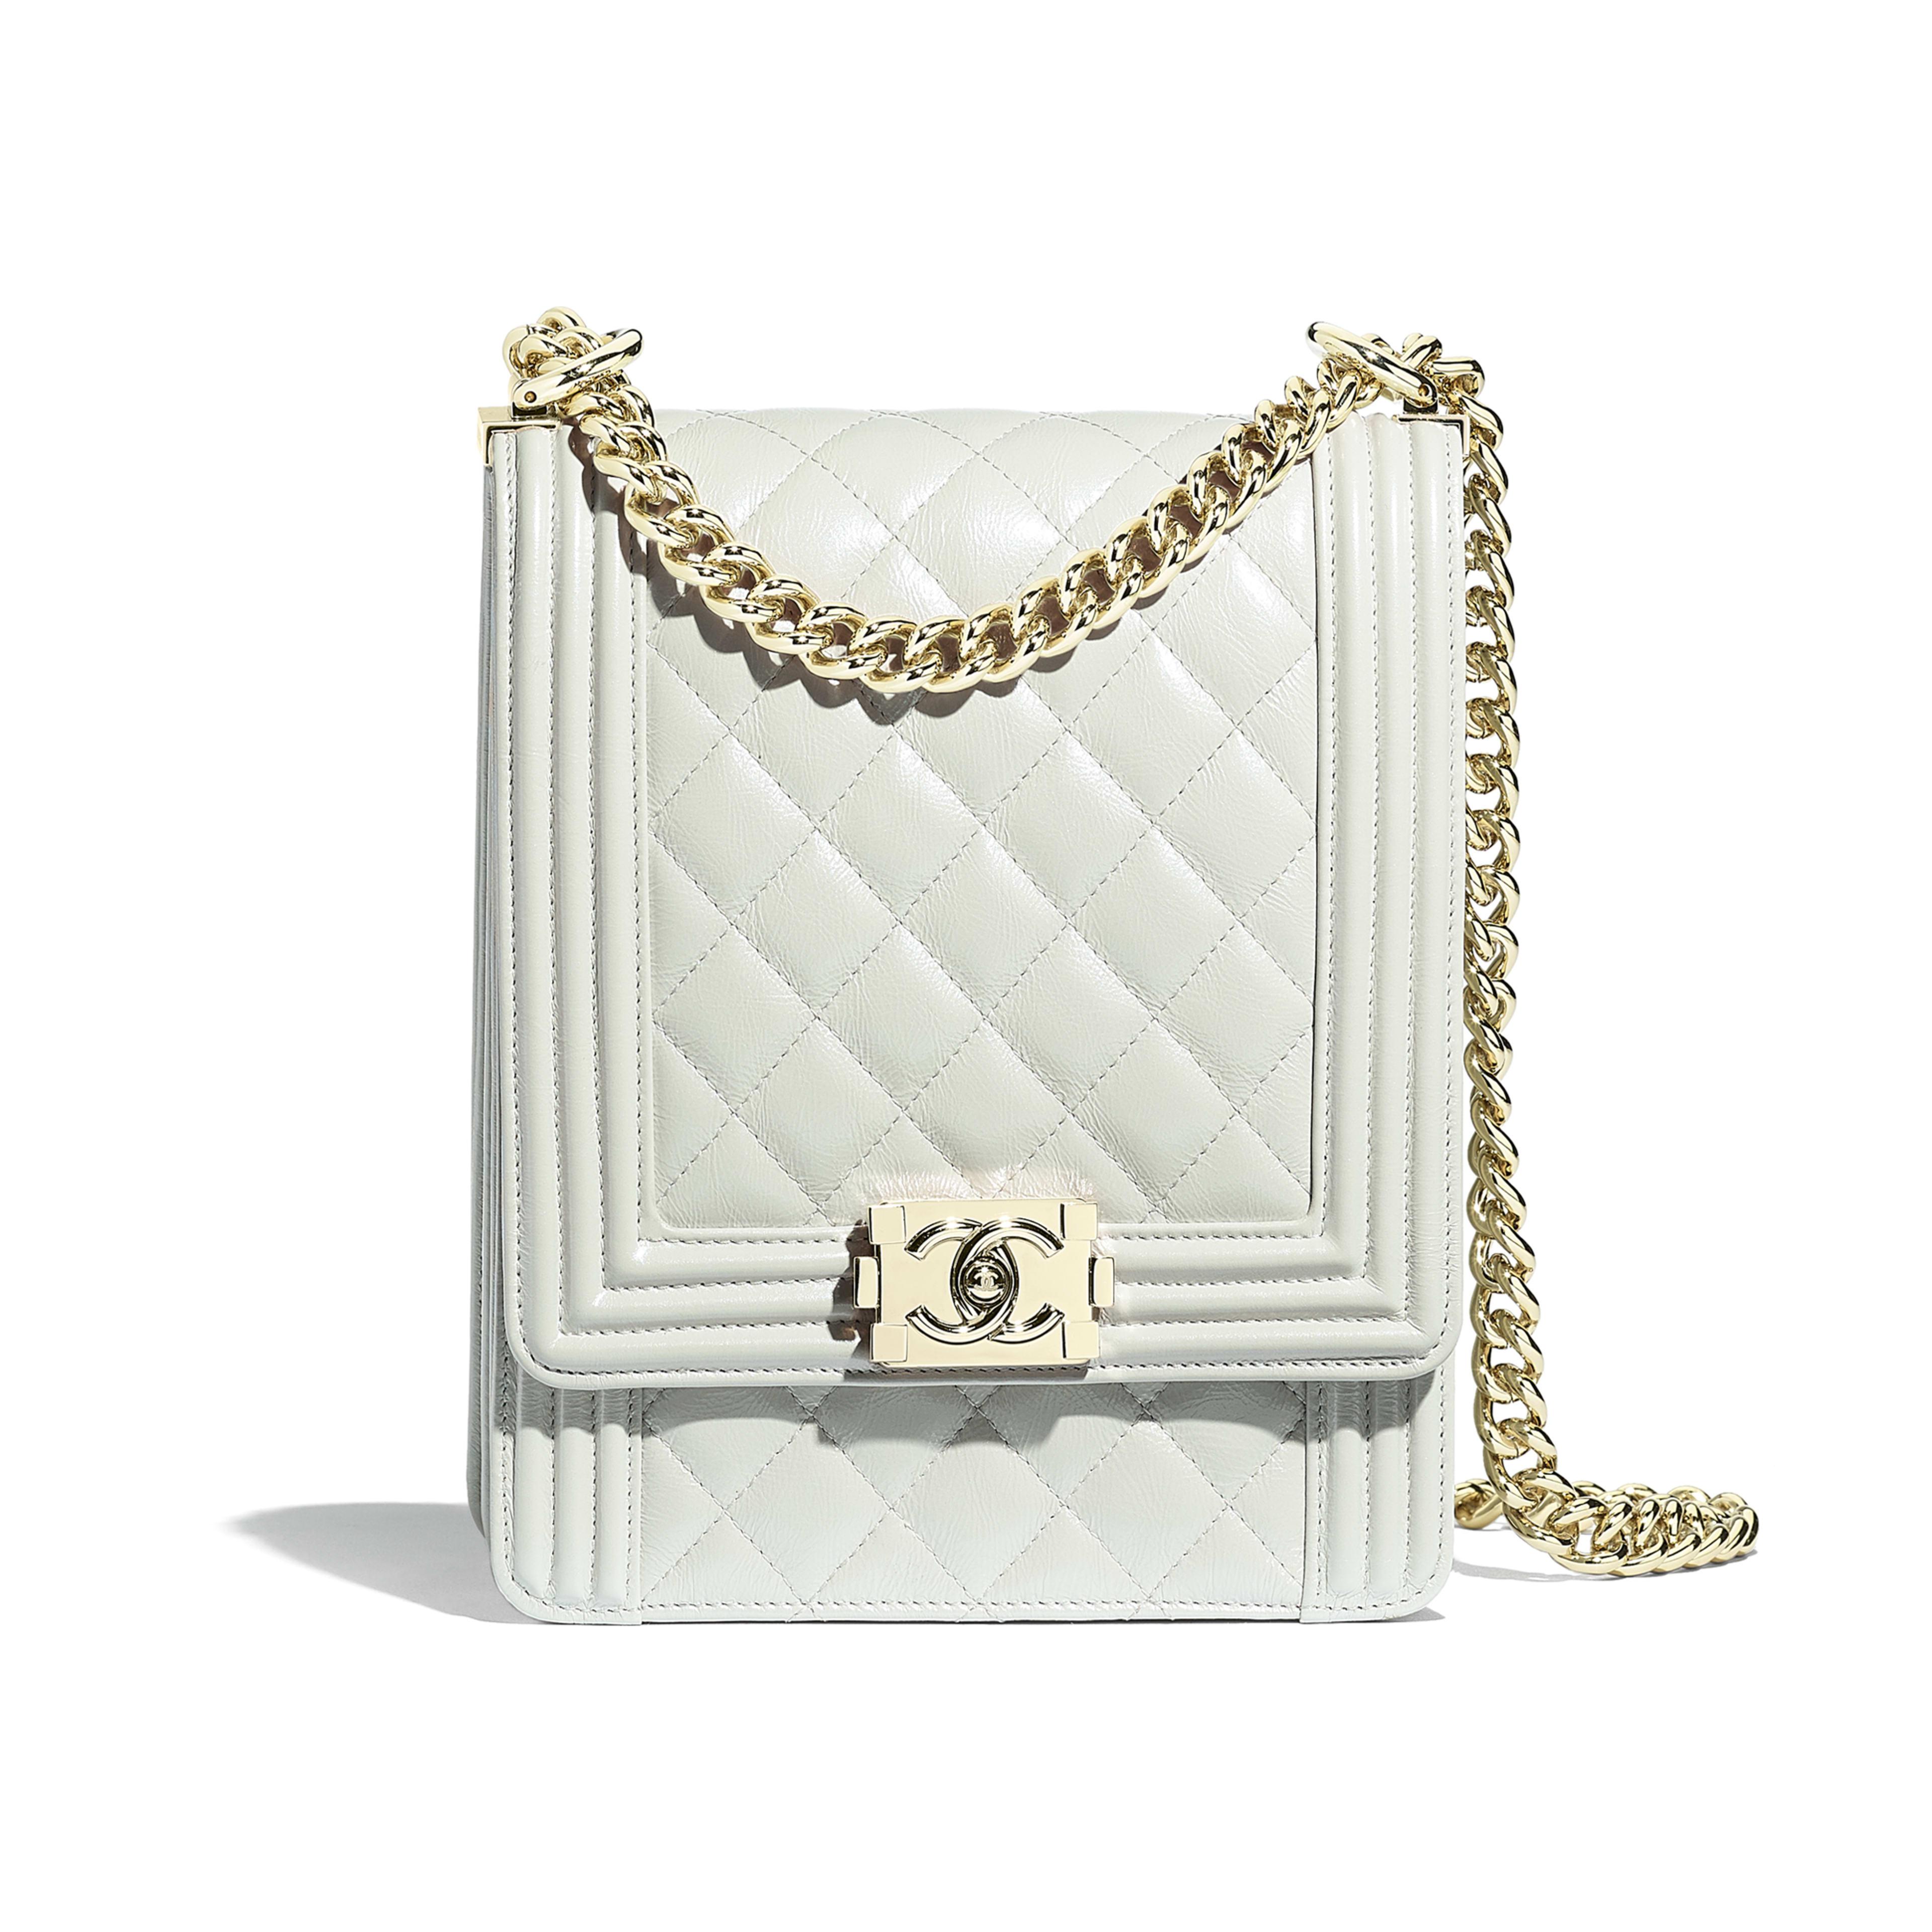 BOY CHANEL Handbag - Light Gray - Iridescent Calfskin & Gold-Tone Metal - Default view - see full sized version